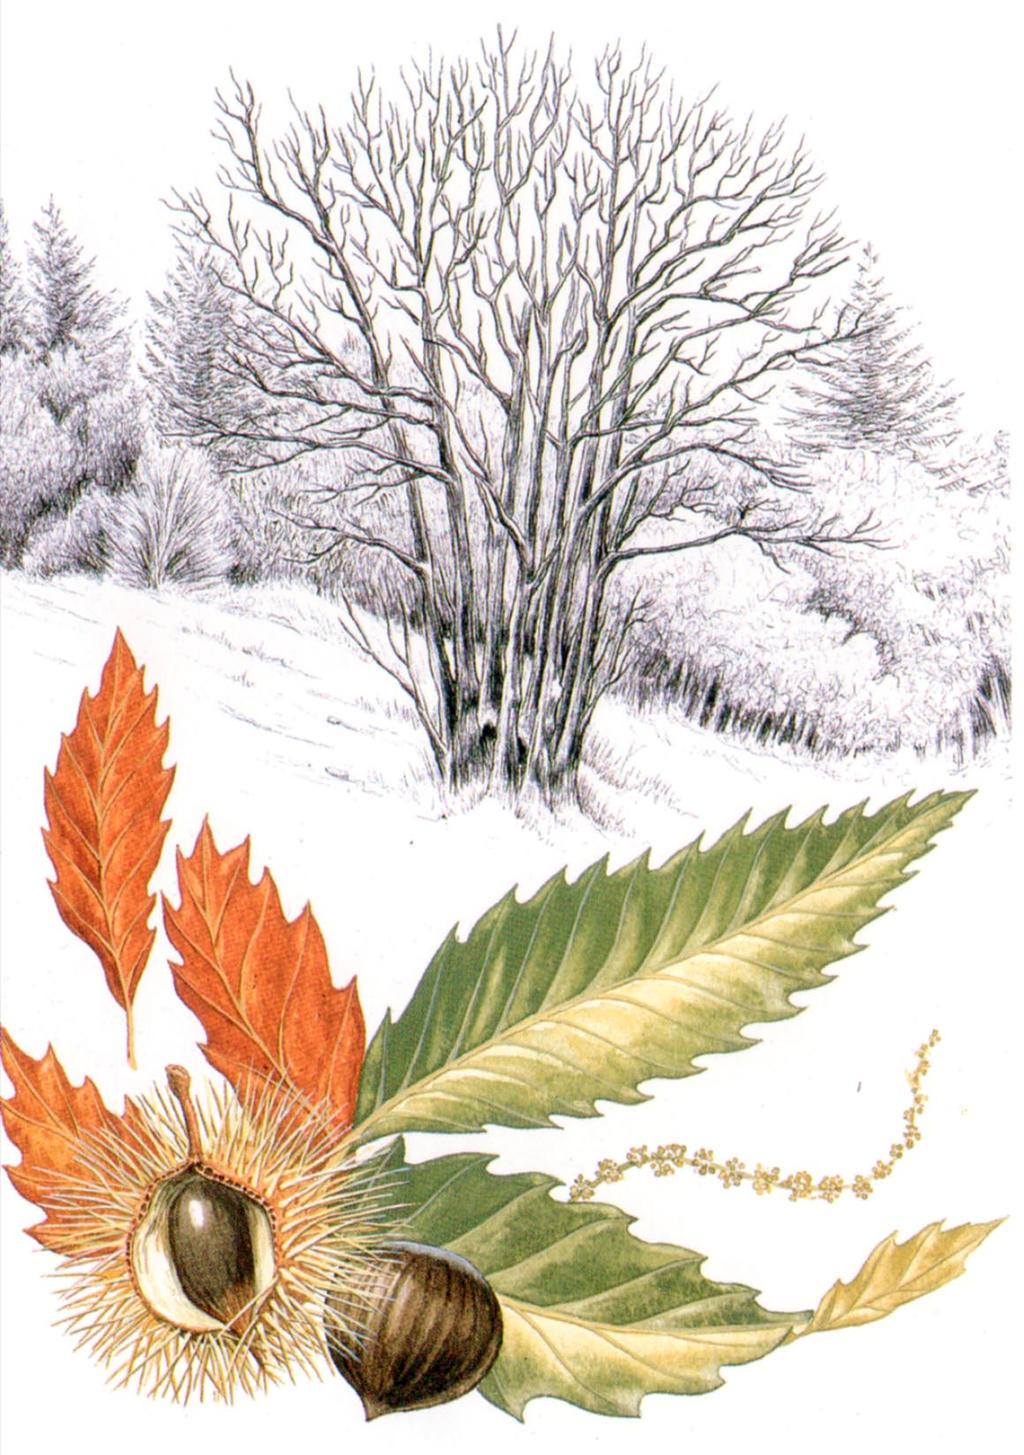 Chesnut tree on winter by AmadeuBlasco